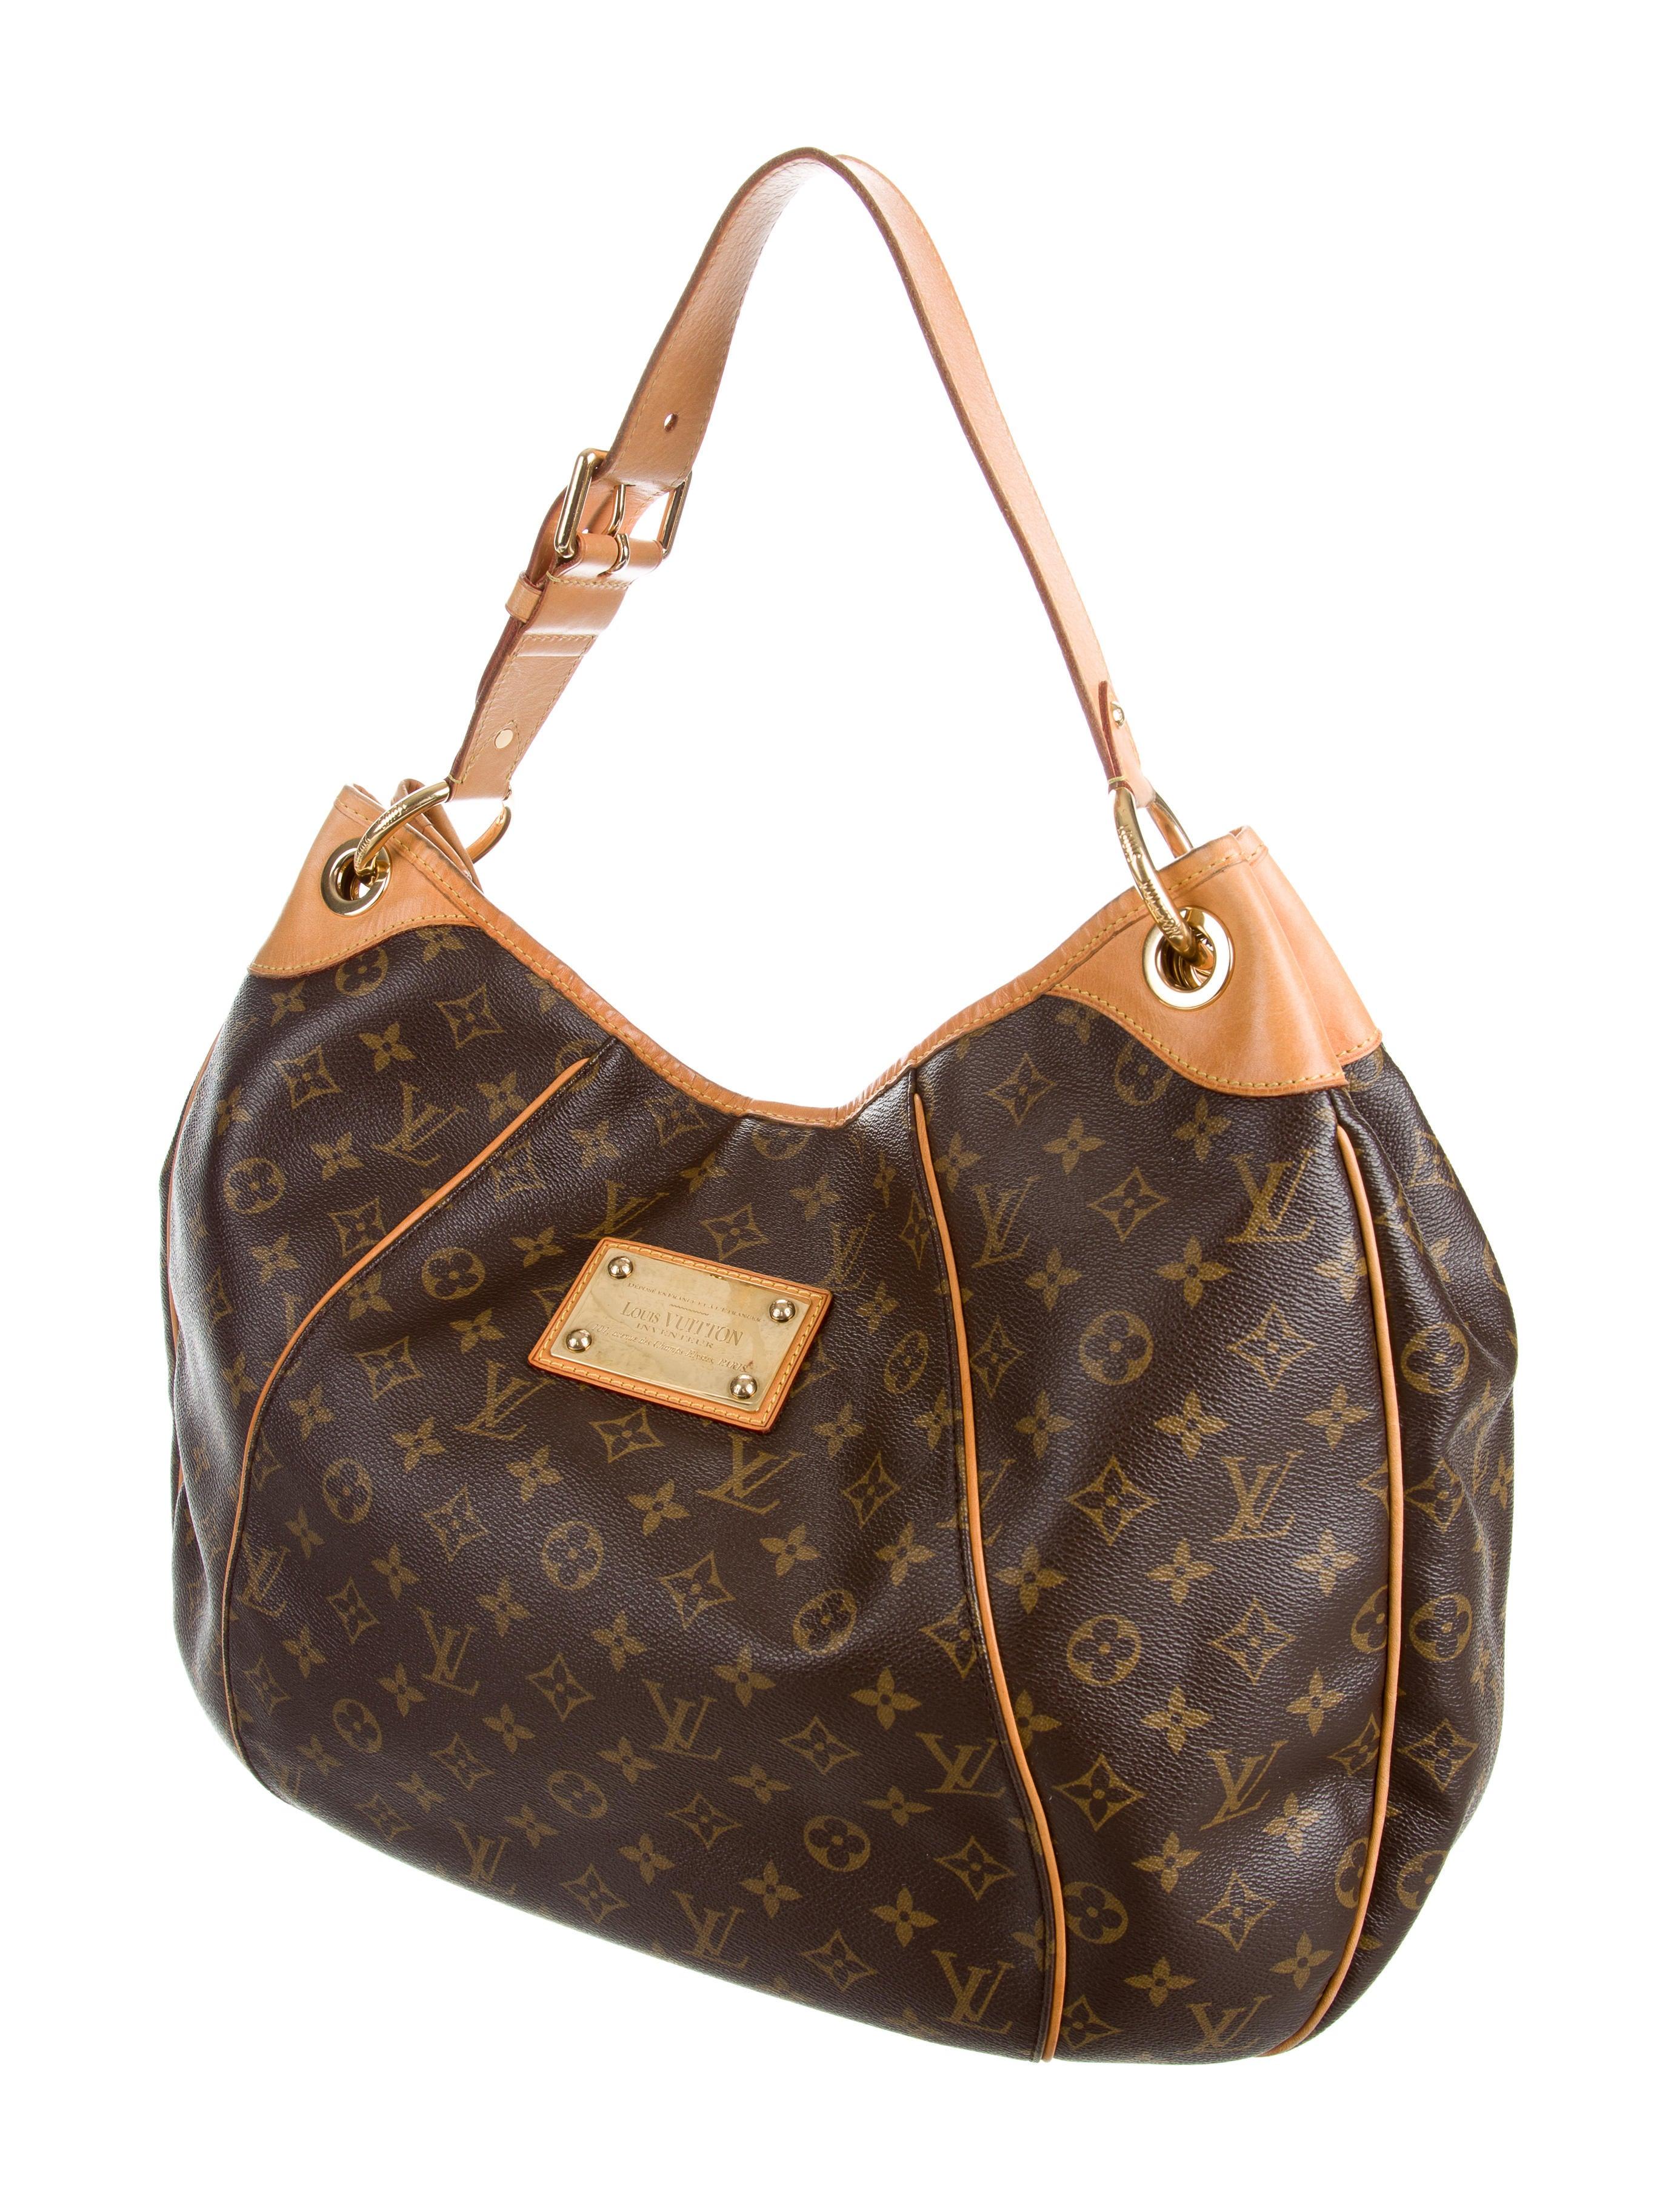 6e95afdb21 Louis Vuitton Monogram Galliera GM - Handbags - LOU124427 | The RealReal